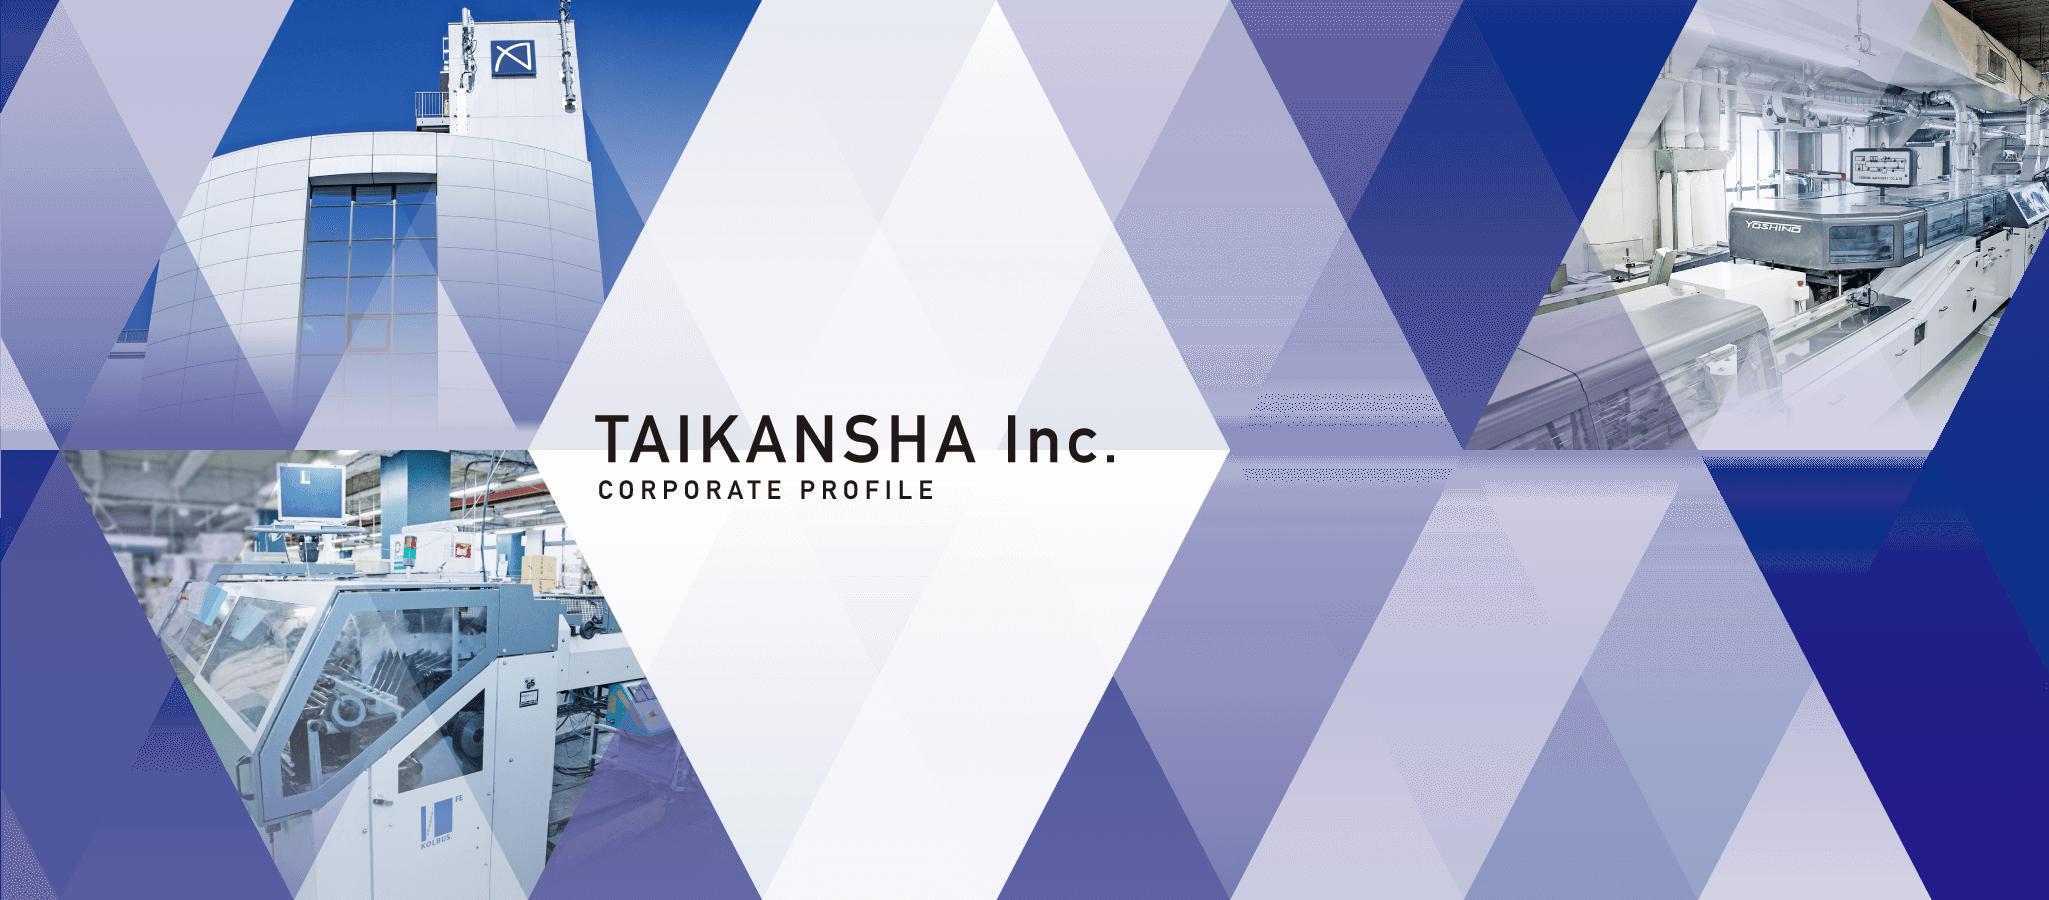 TAIKANSHA Corp. CORPORATE PROFILE